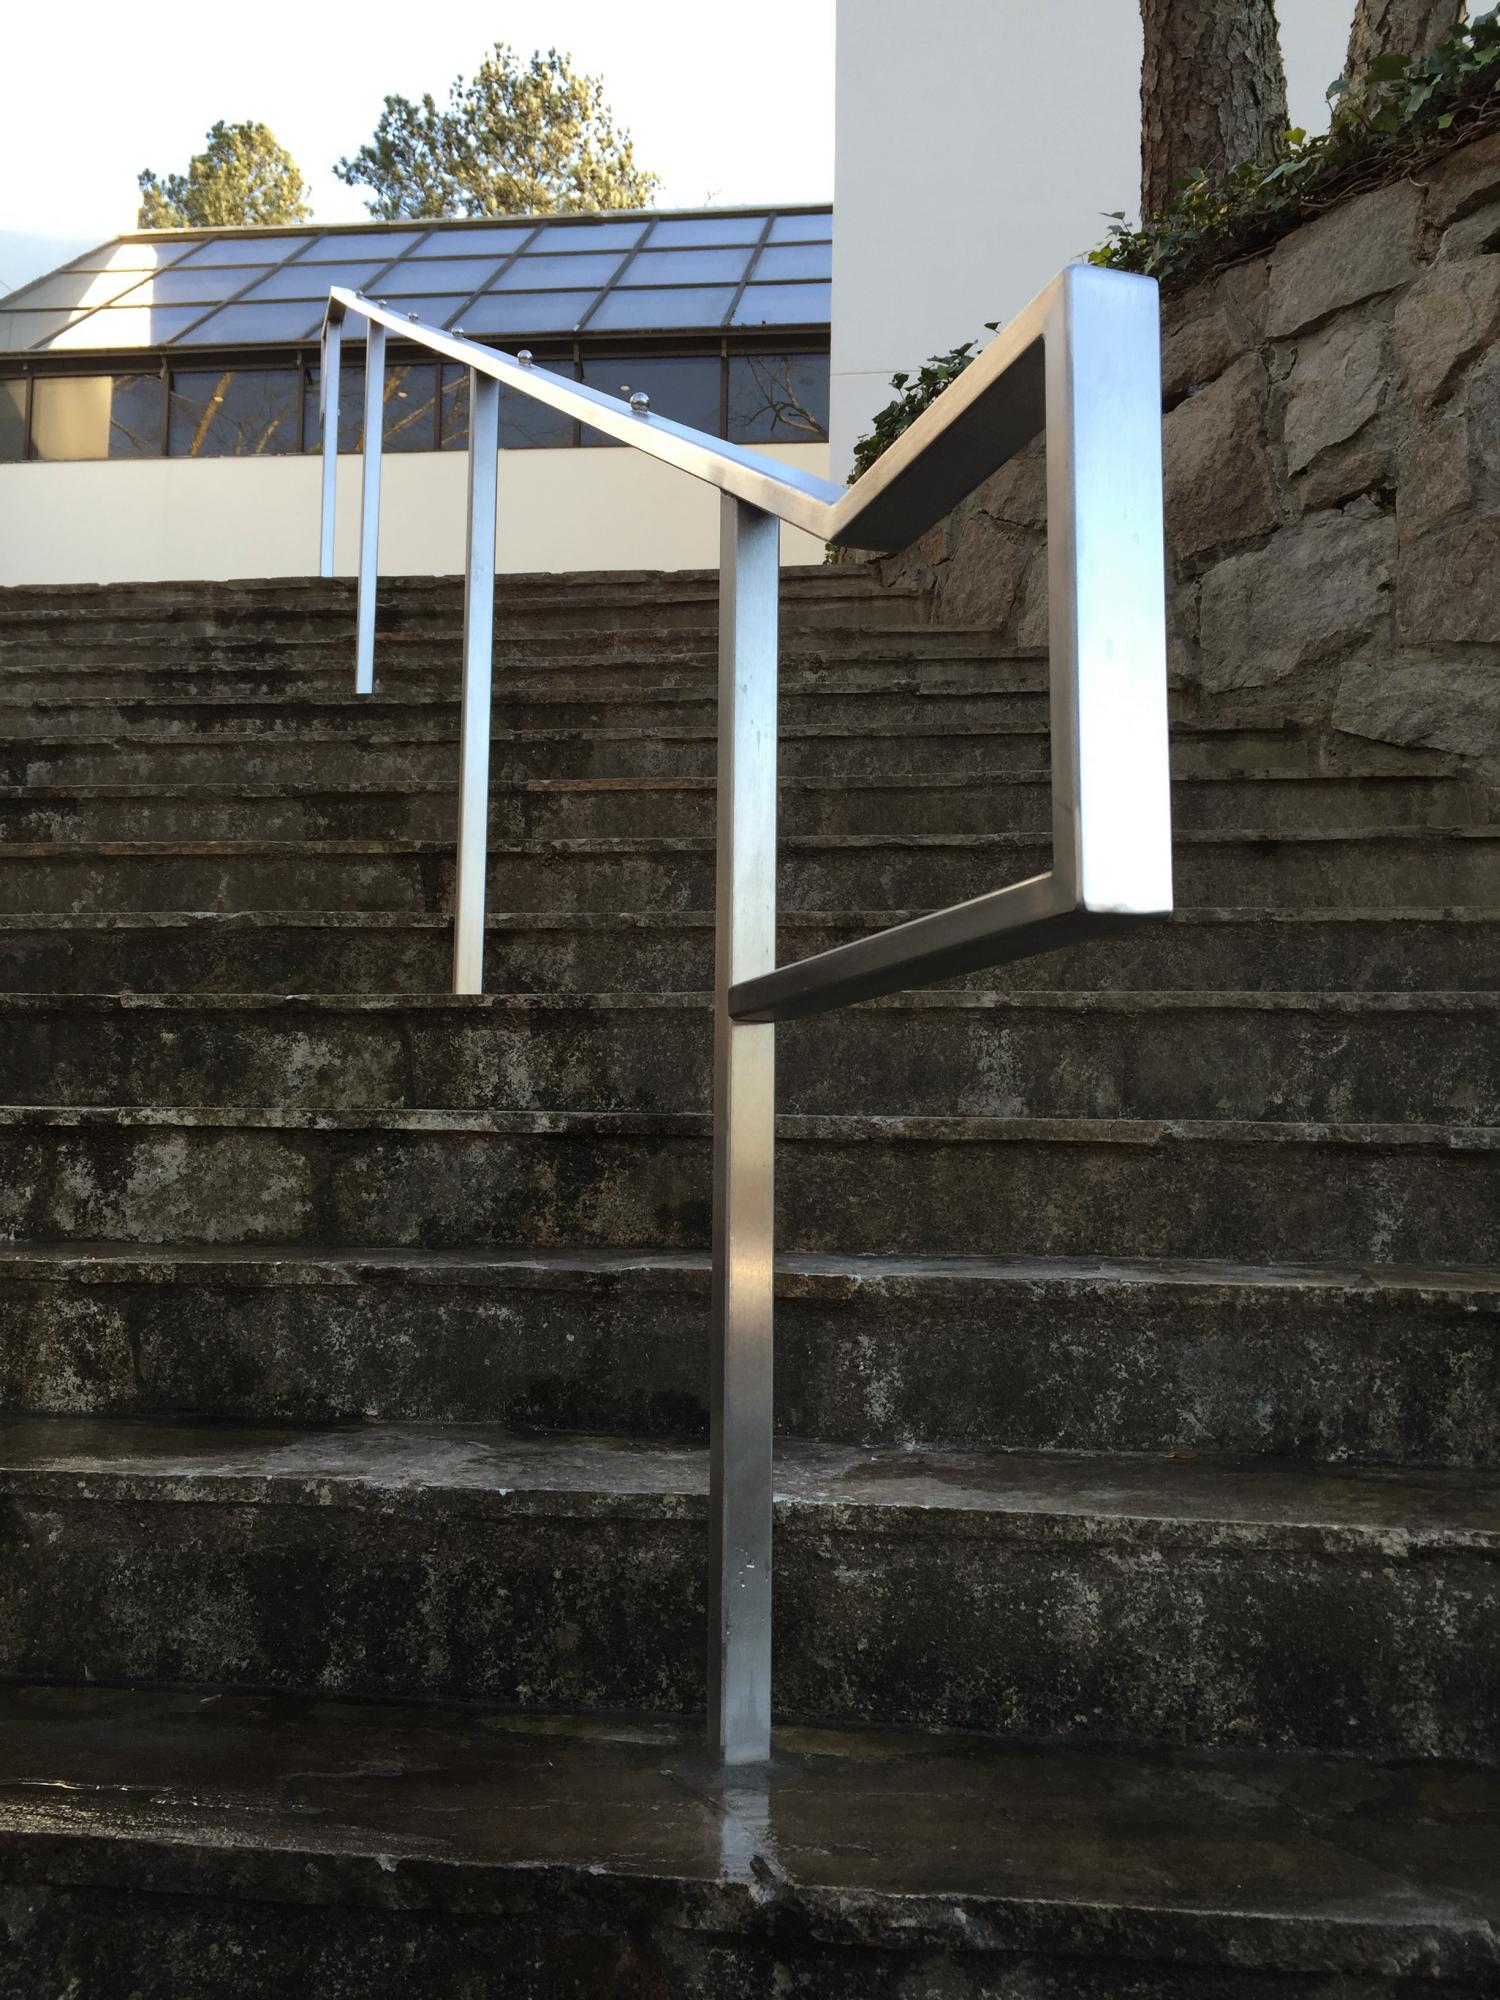 Stainless Hand Rail with Skateboarding Deterrents